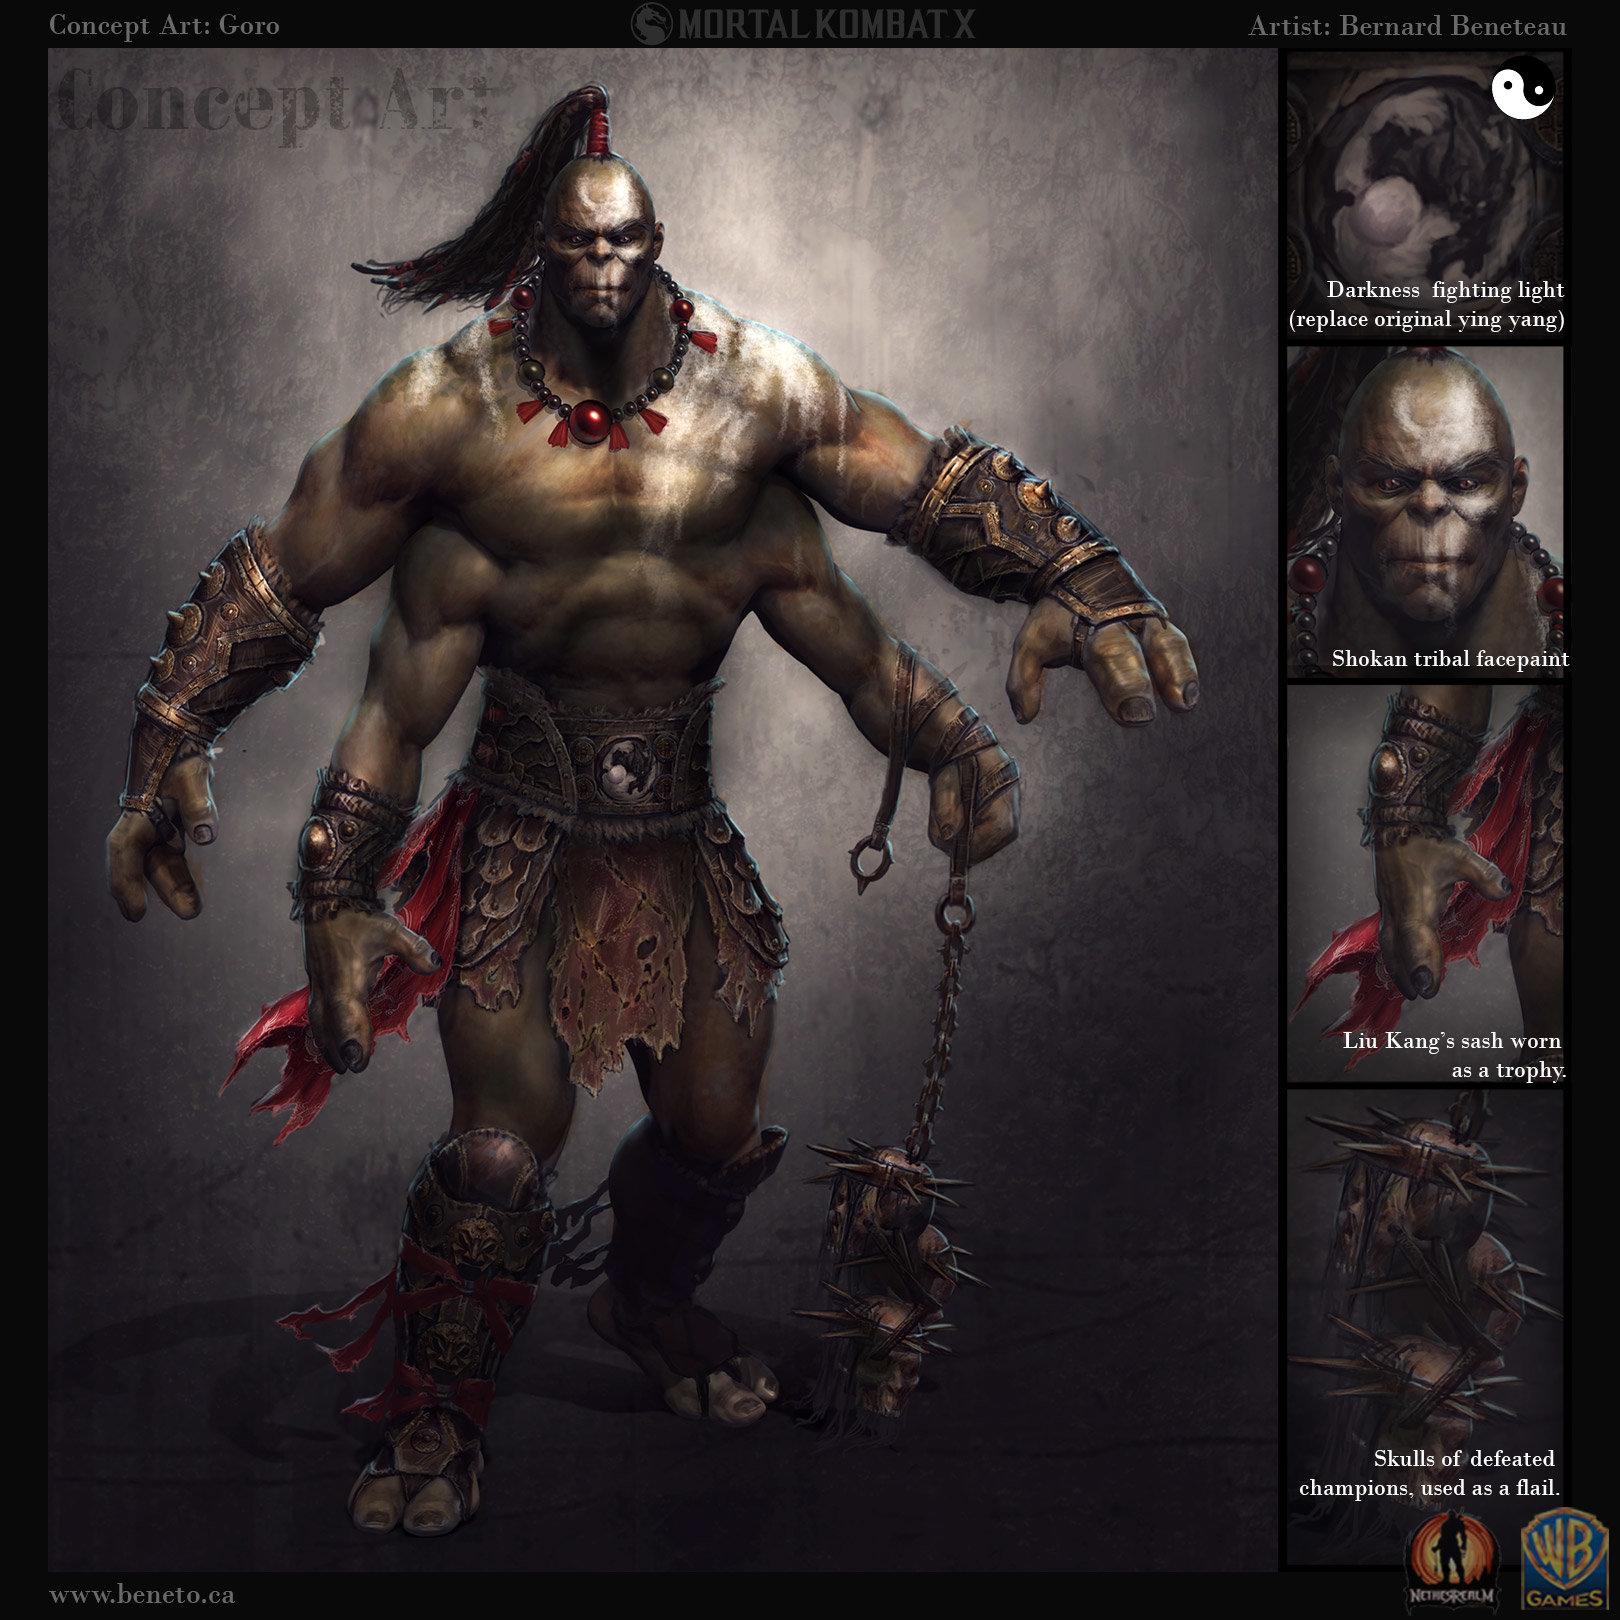 ArtStation - Concept Art: Mortal Kombat X- Goro, Bernard